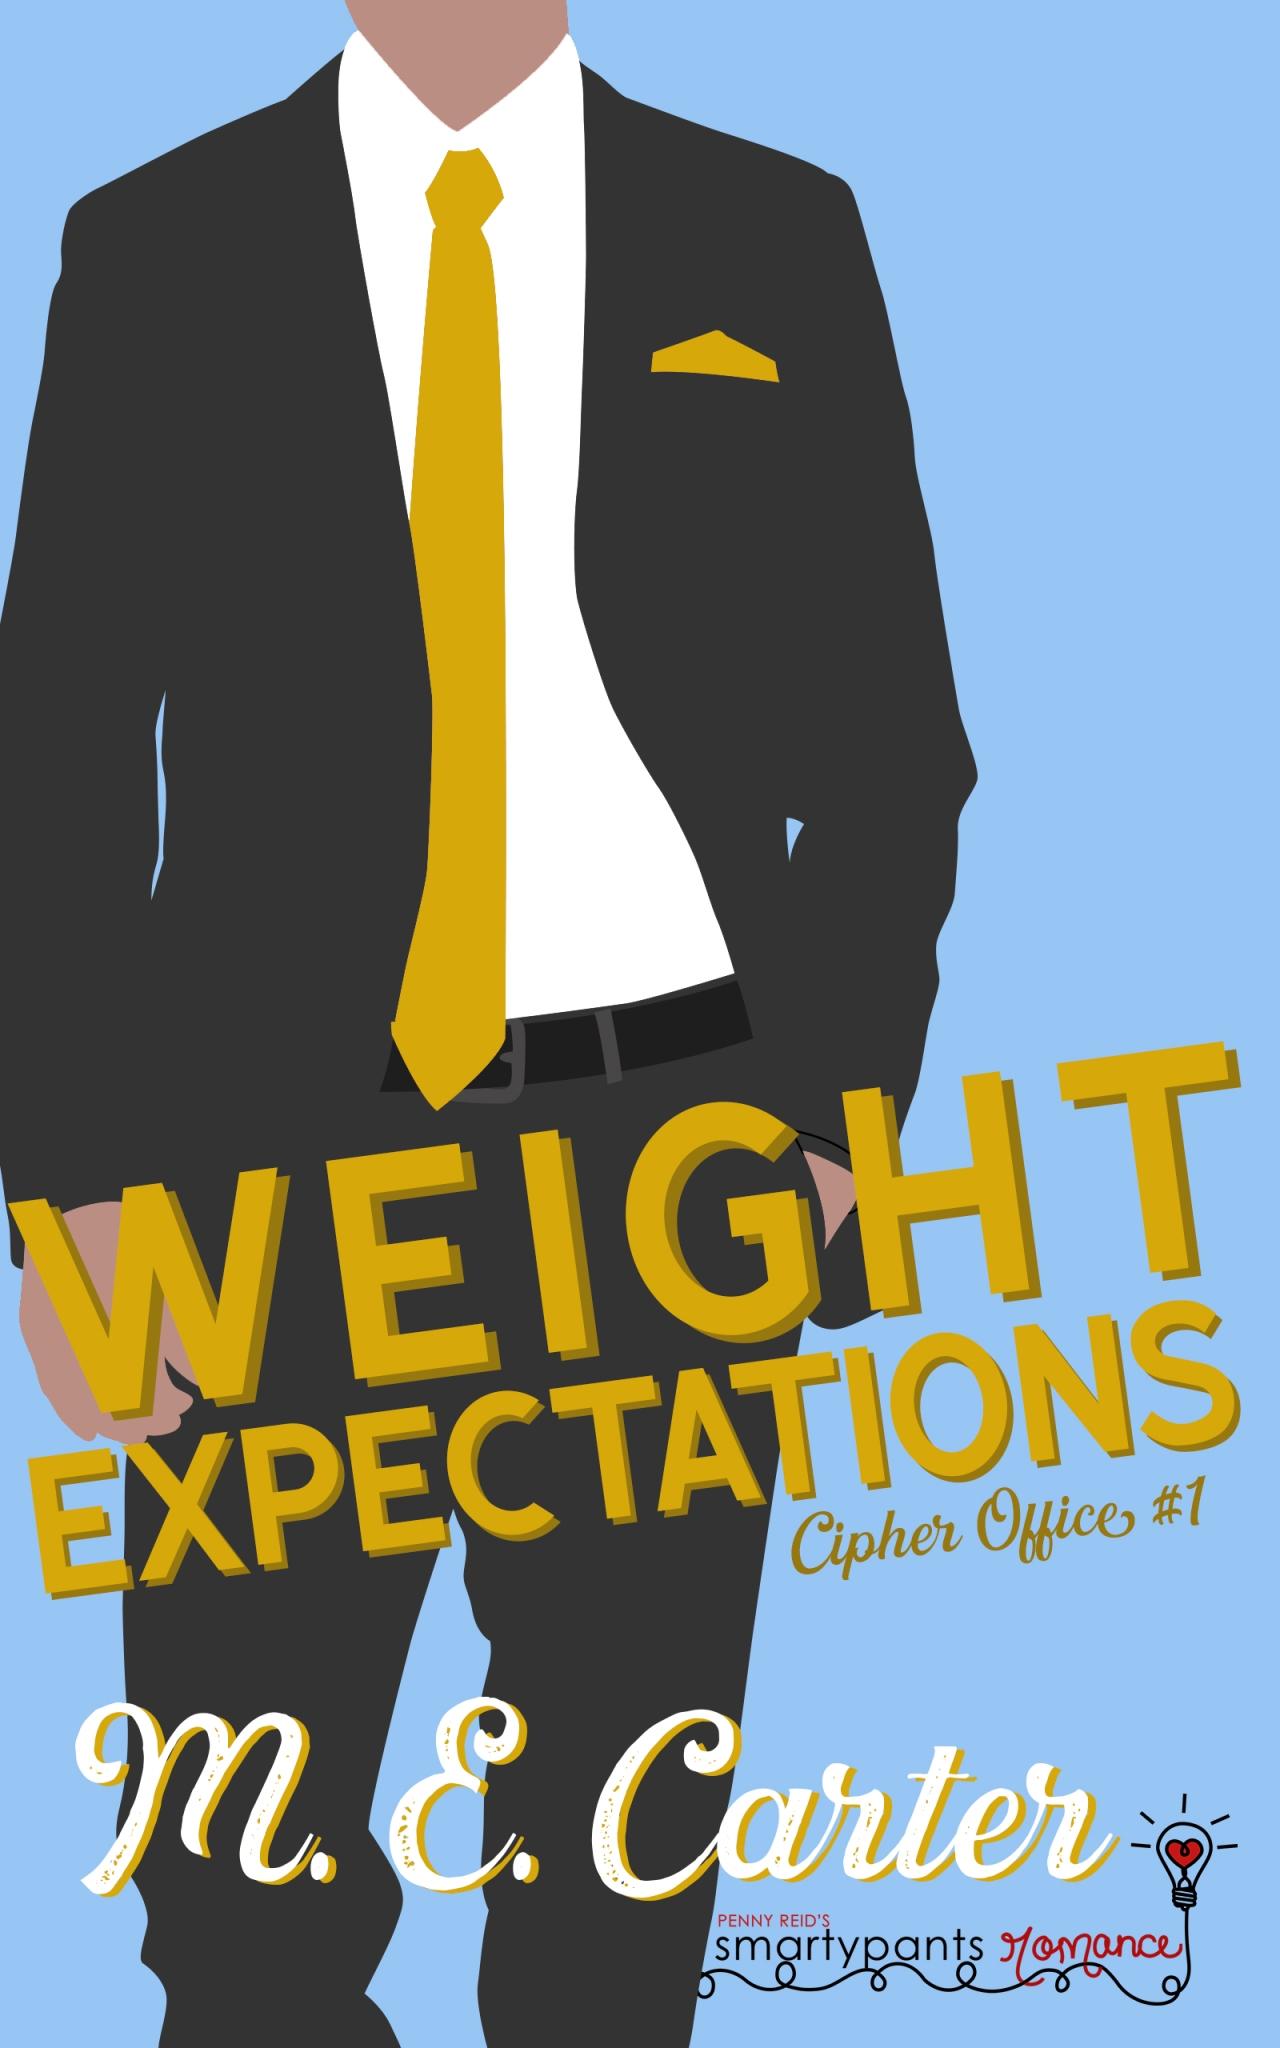 20180715_CO01_Weight Expectations_Carter_KDP_FINAL